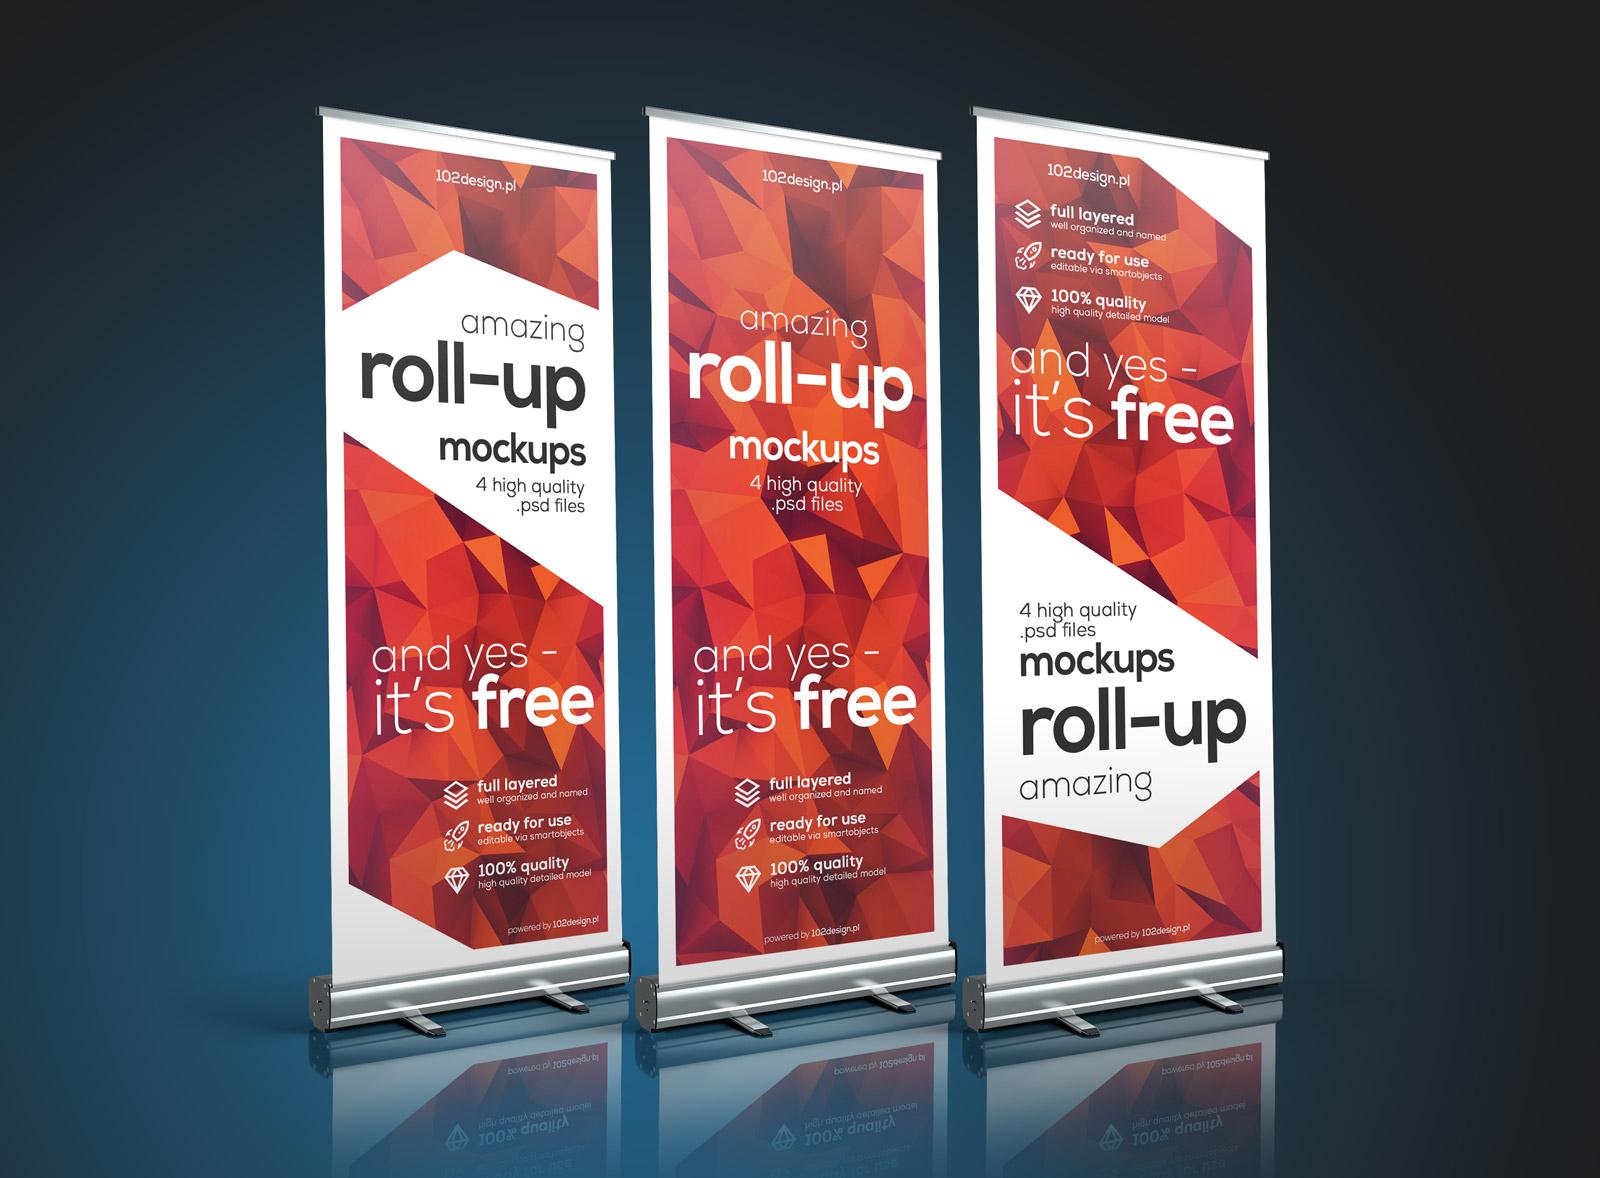 Free-Premuim-Roll-up-Banner-Stand-Mockup-PSD-2